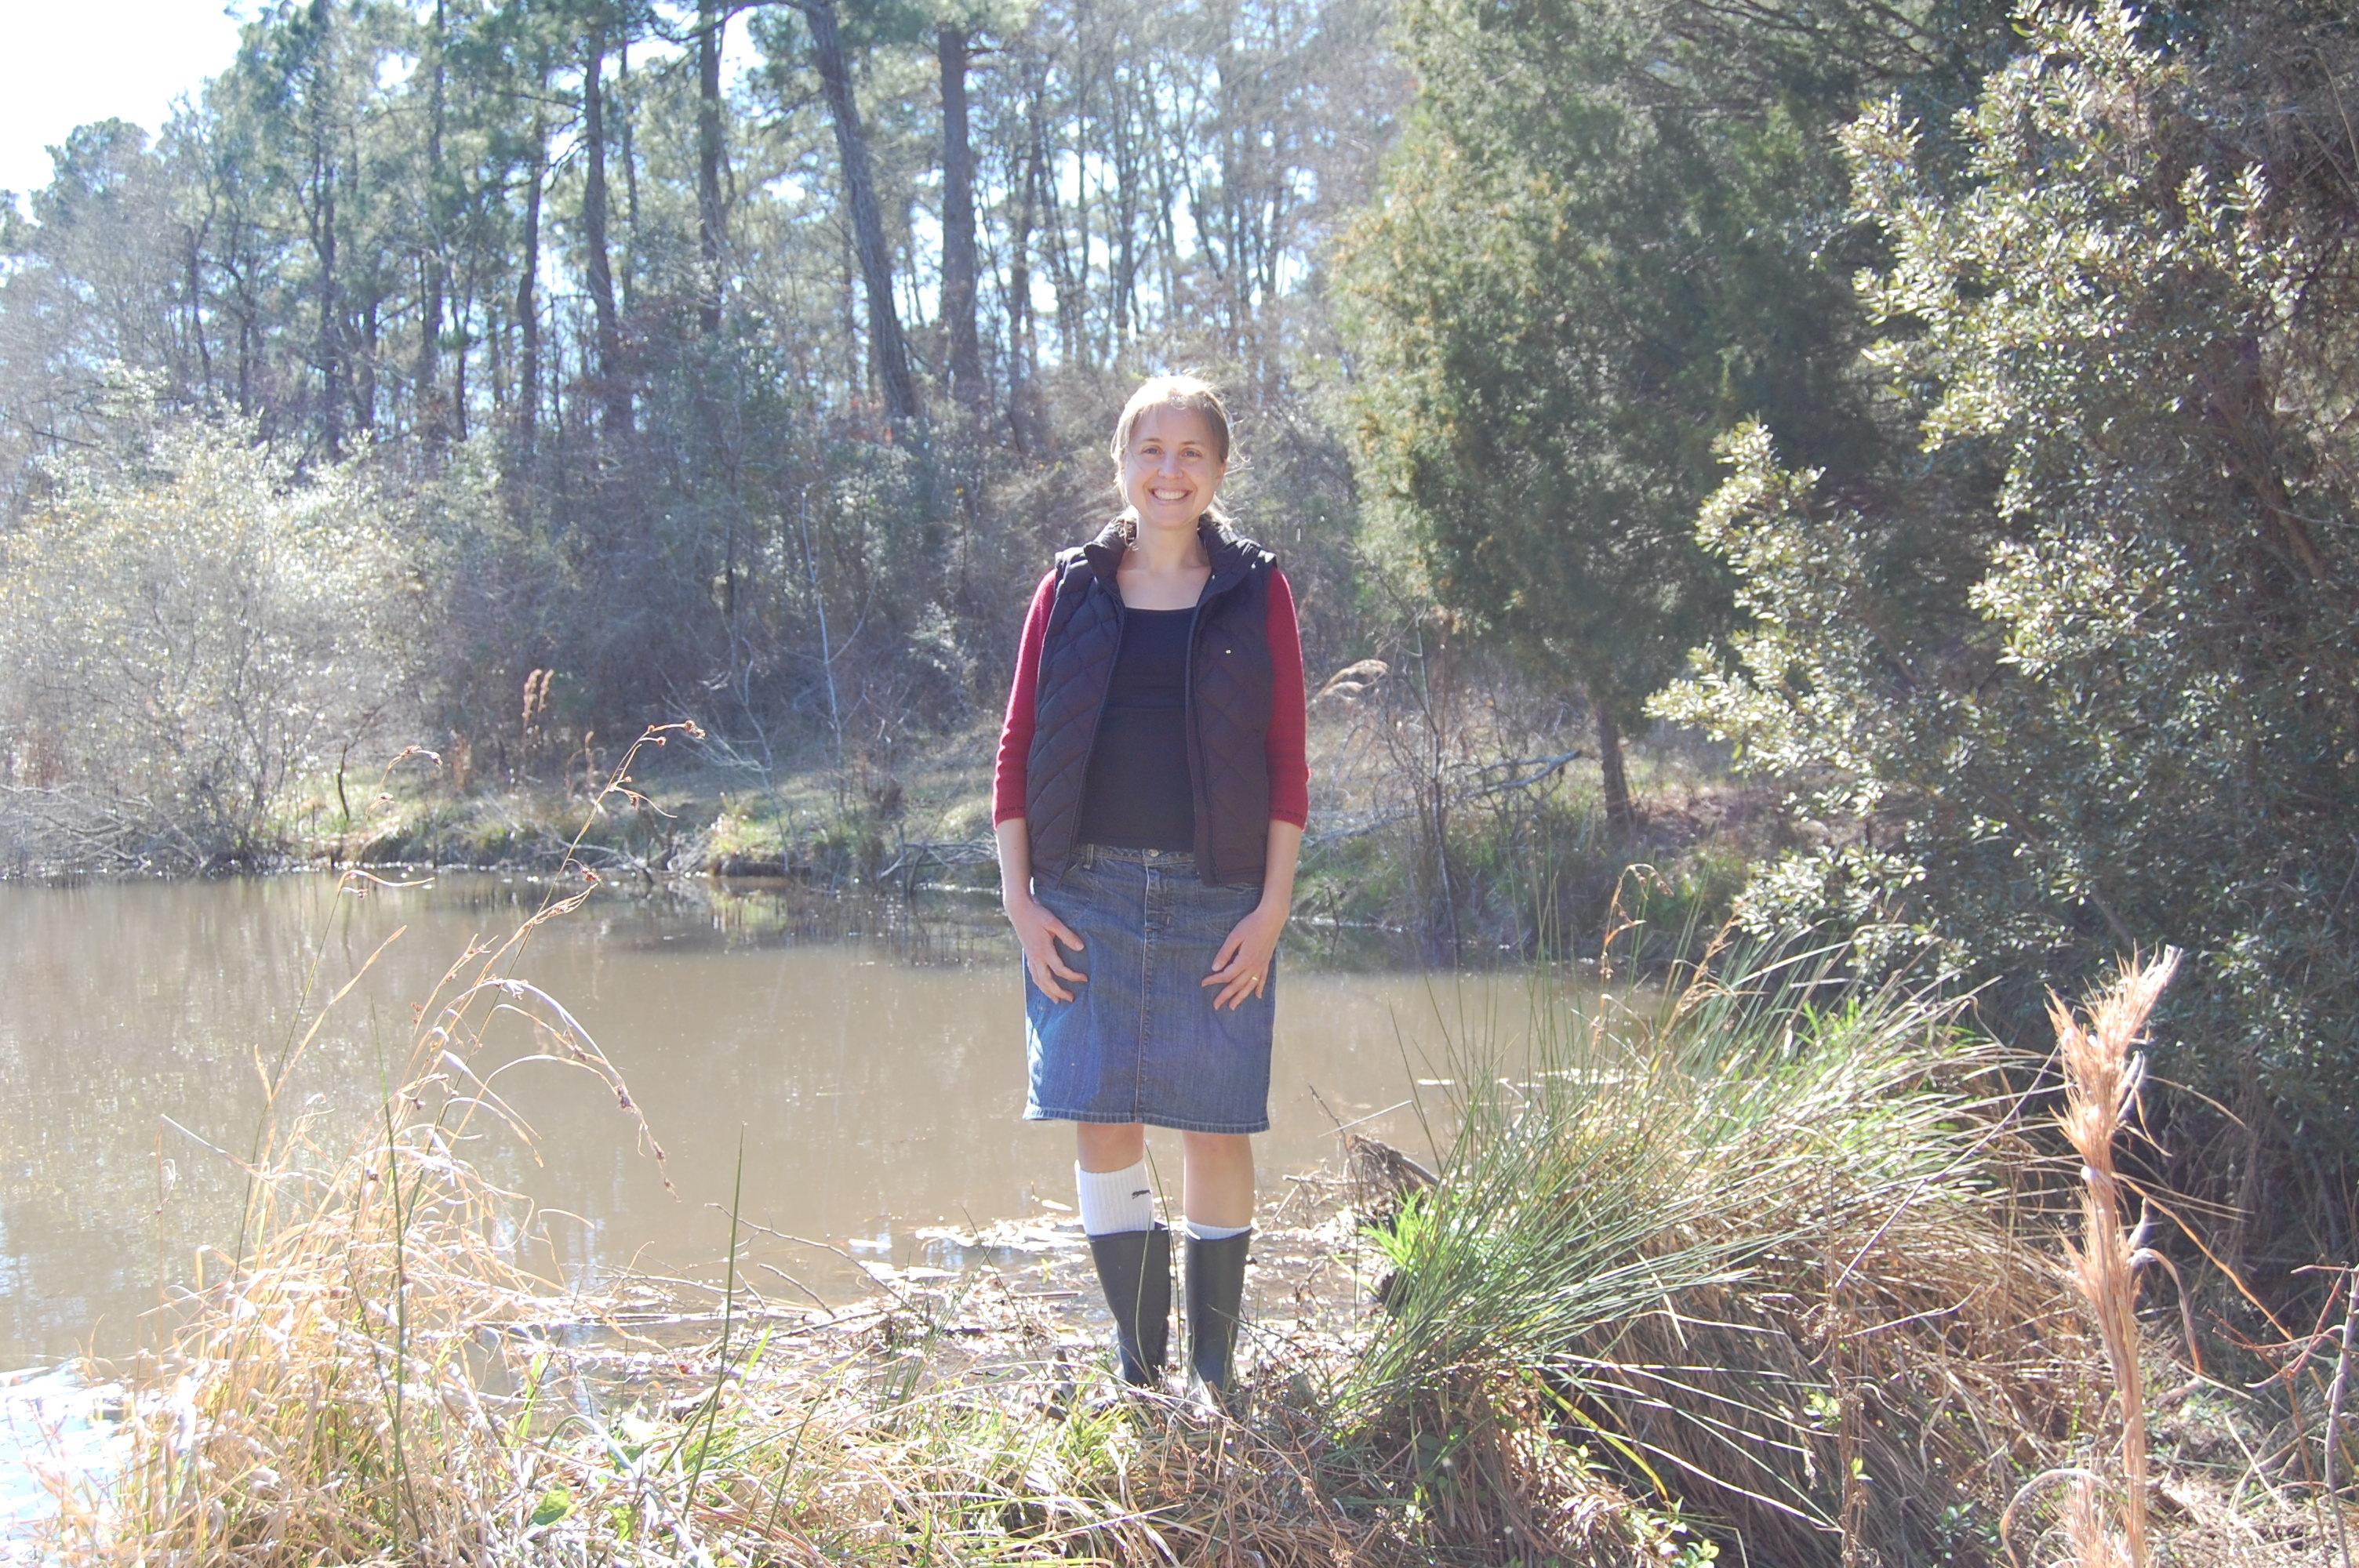 Angela standing on the beaver dam